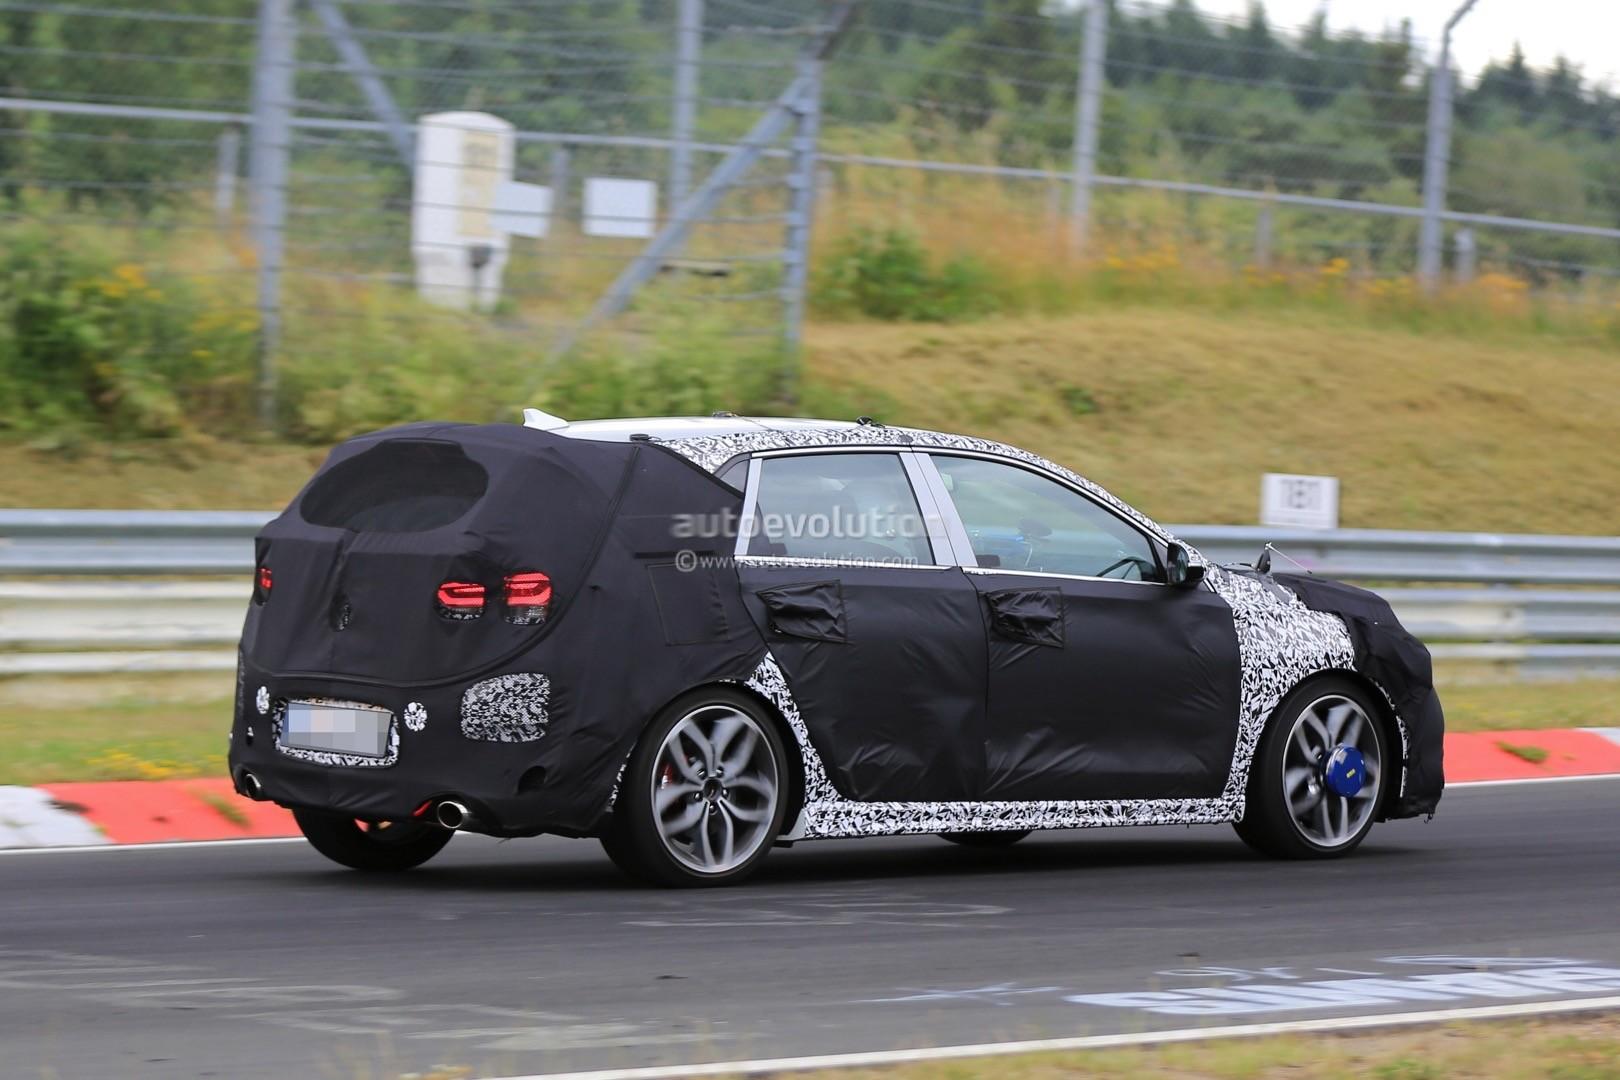 2017 hyundai i30 n spied on the nurburgring sounds nasty autoevolution. Black Bedroom Furniture Sets. Home Design Ideas